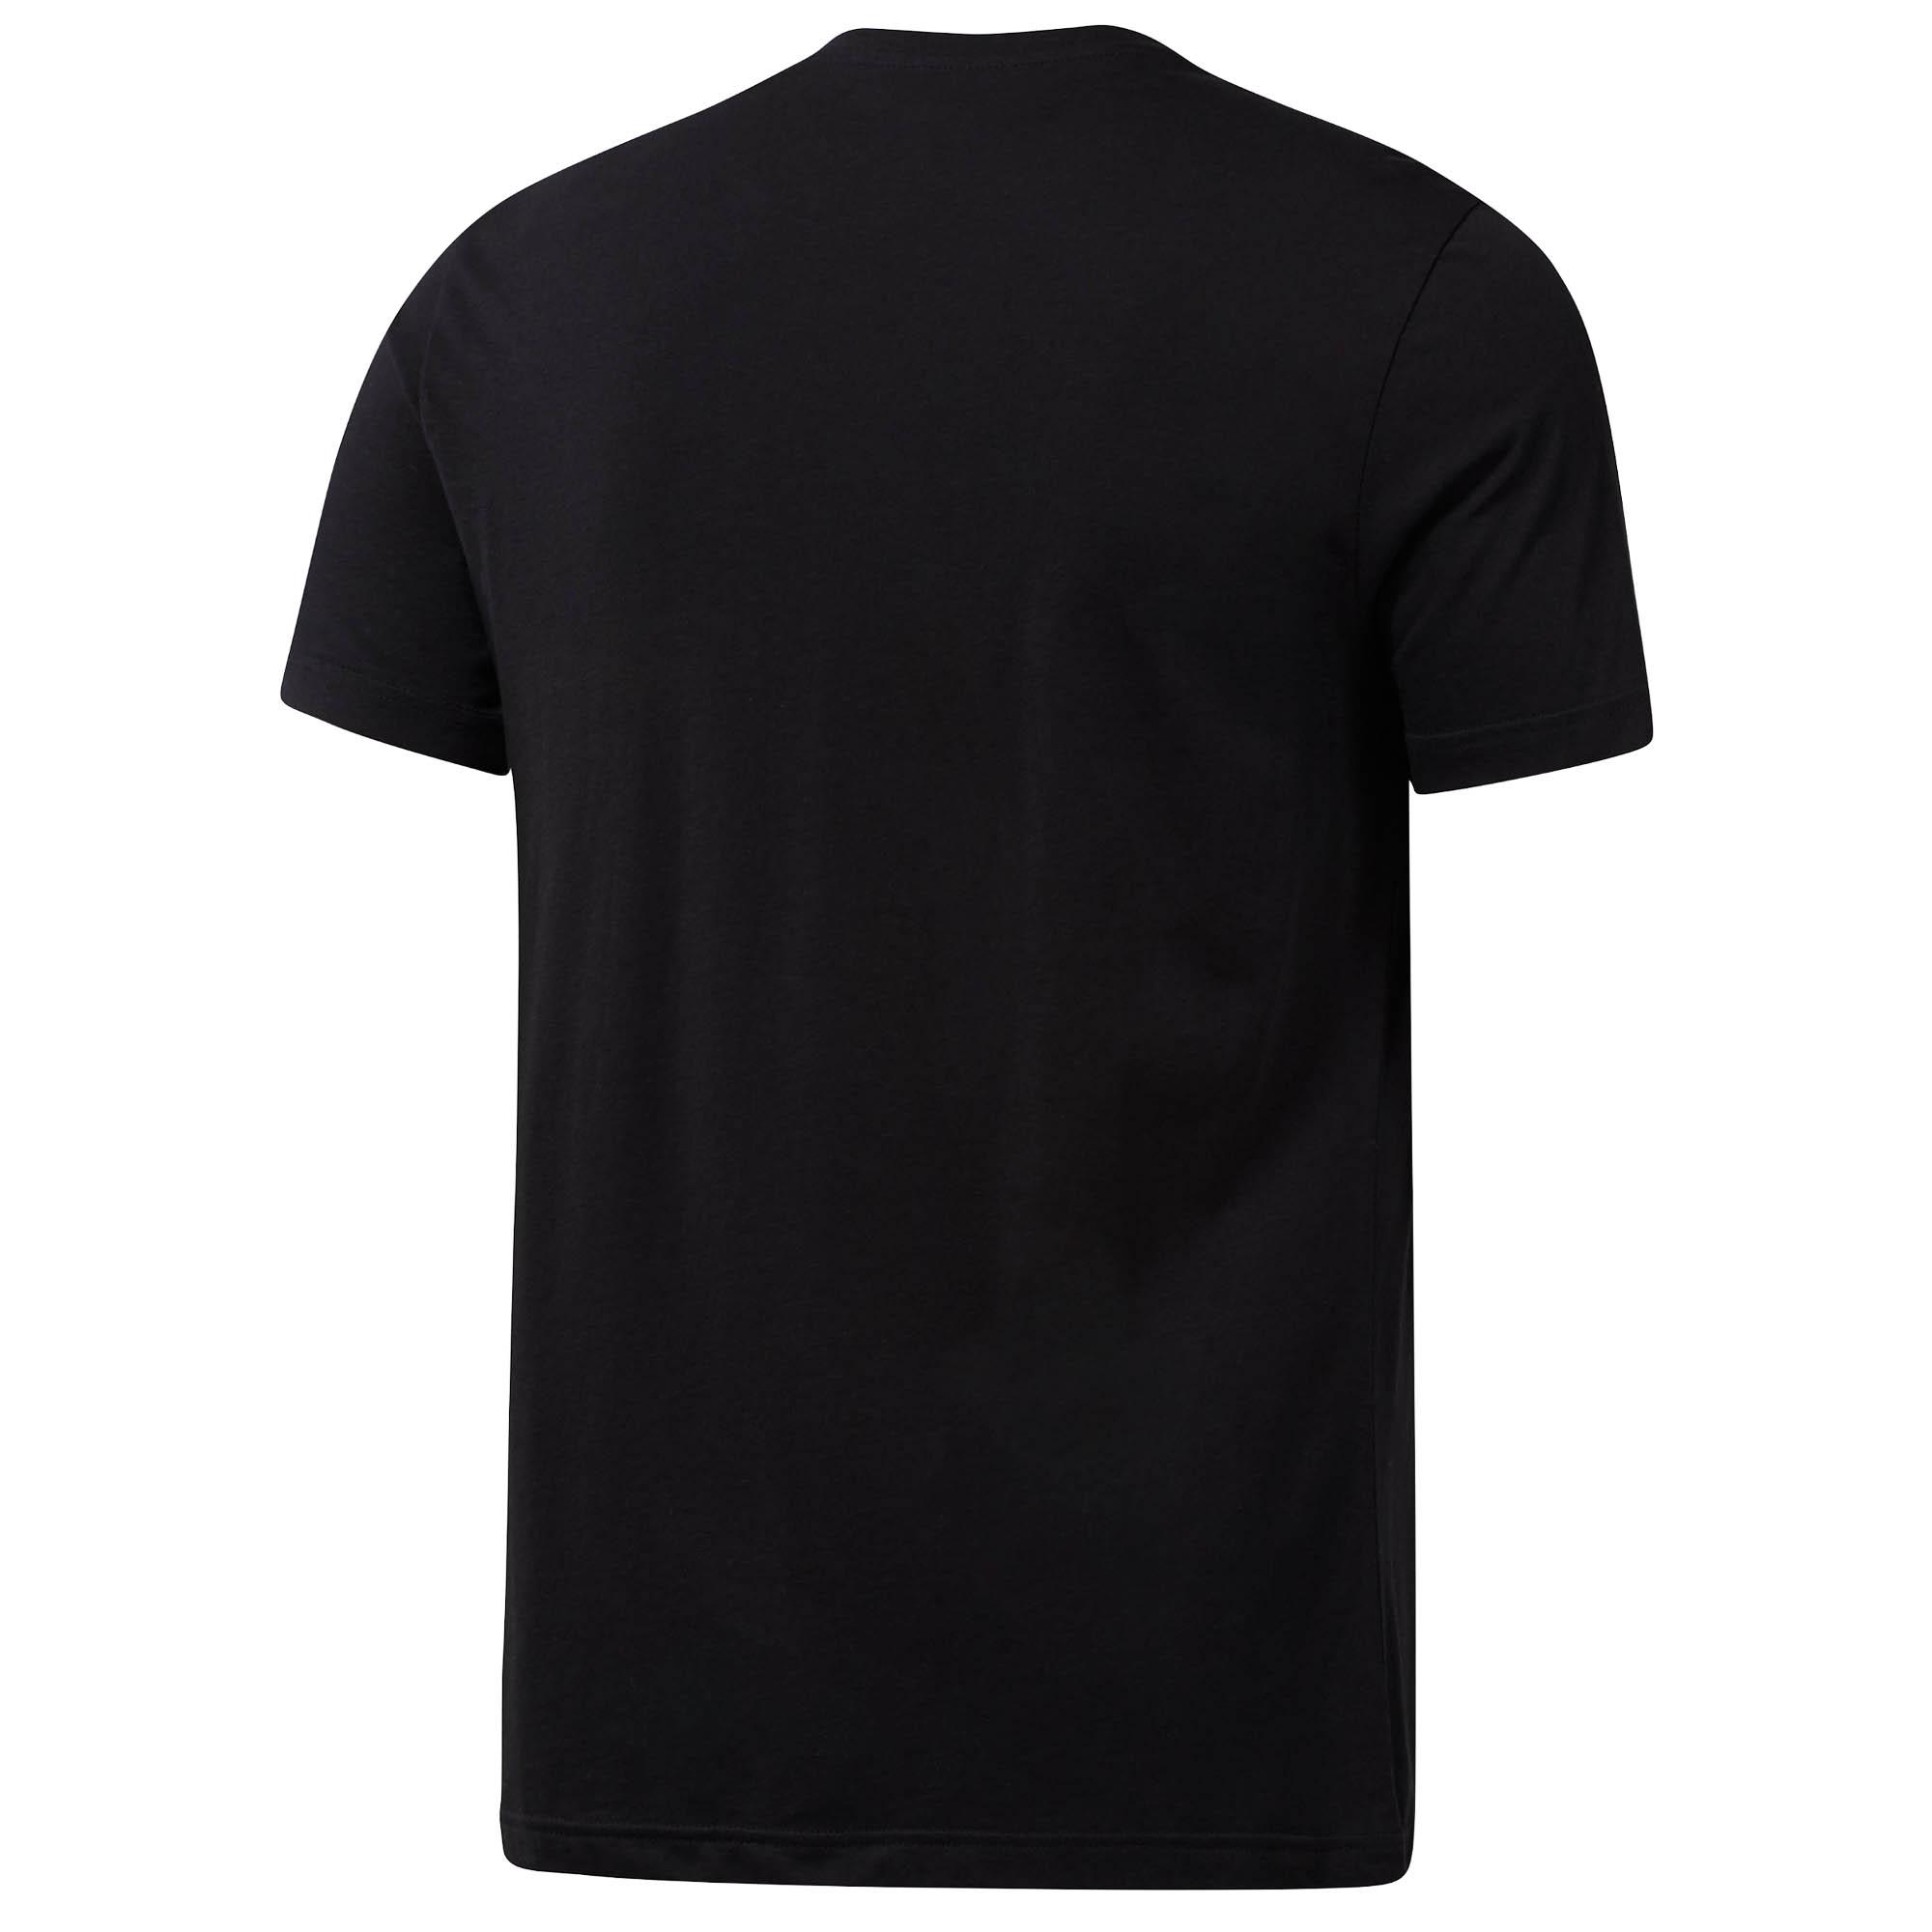 Reebok-UFC-MMA-Text-Mens-Training-Fitness-Fight-T-Shirt-Tee-Black thumbnail 4